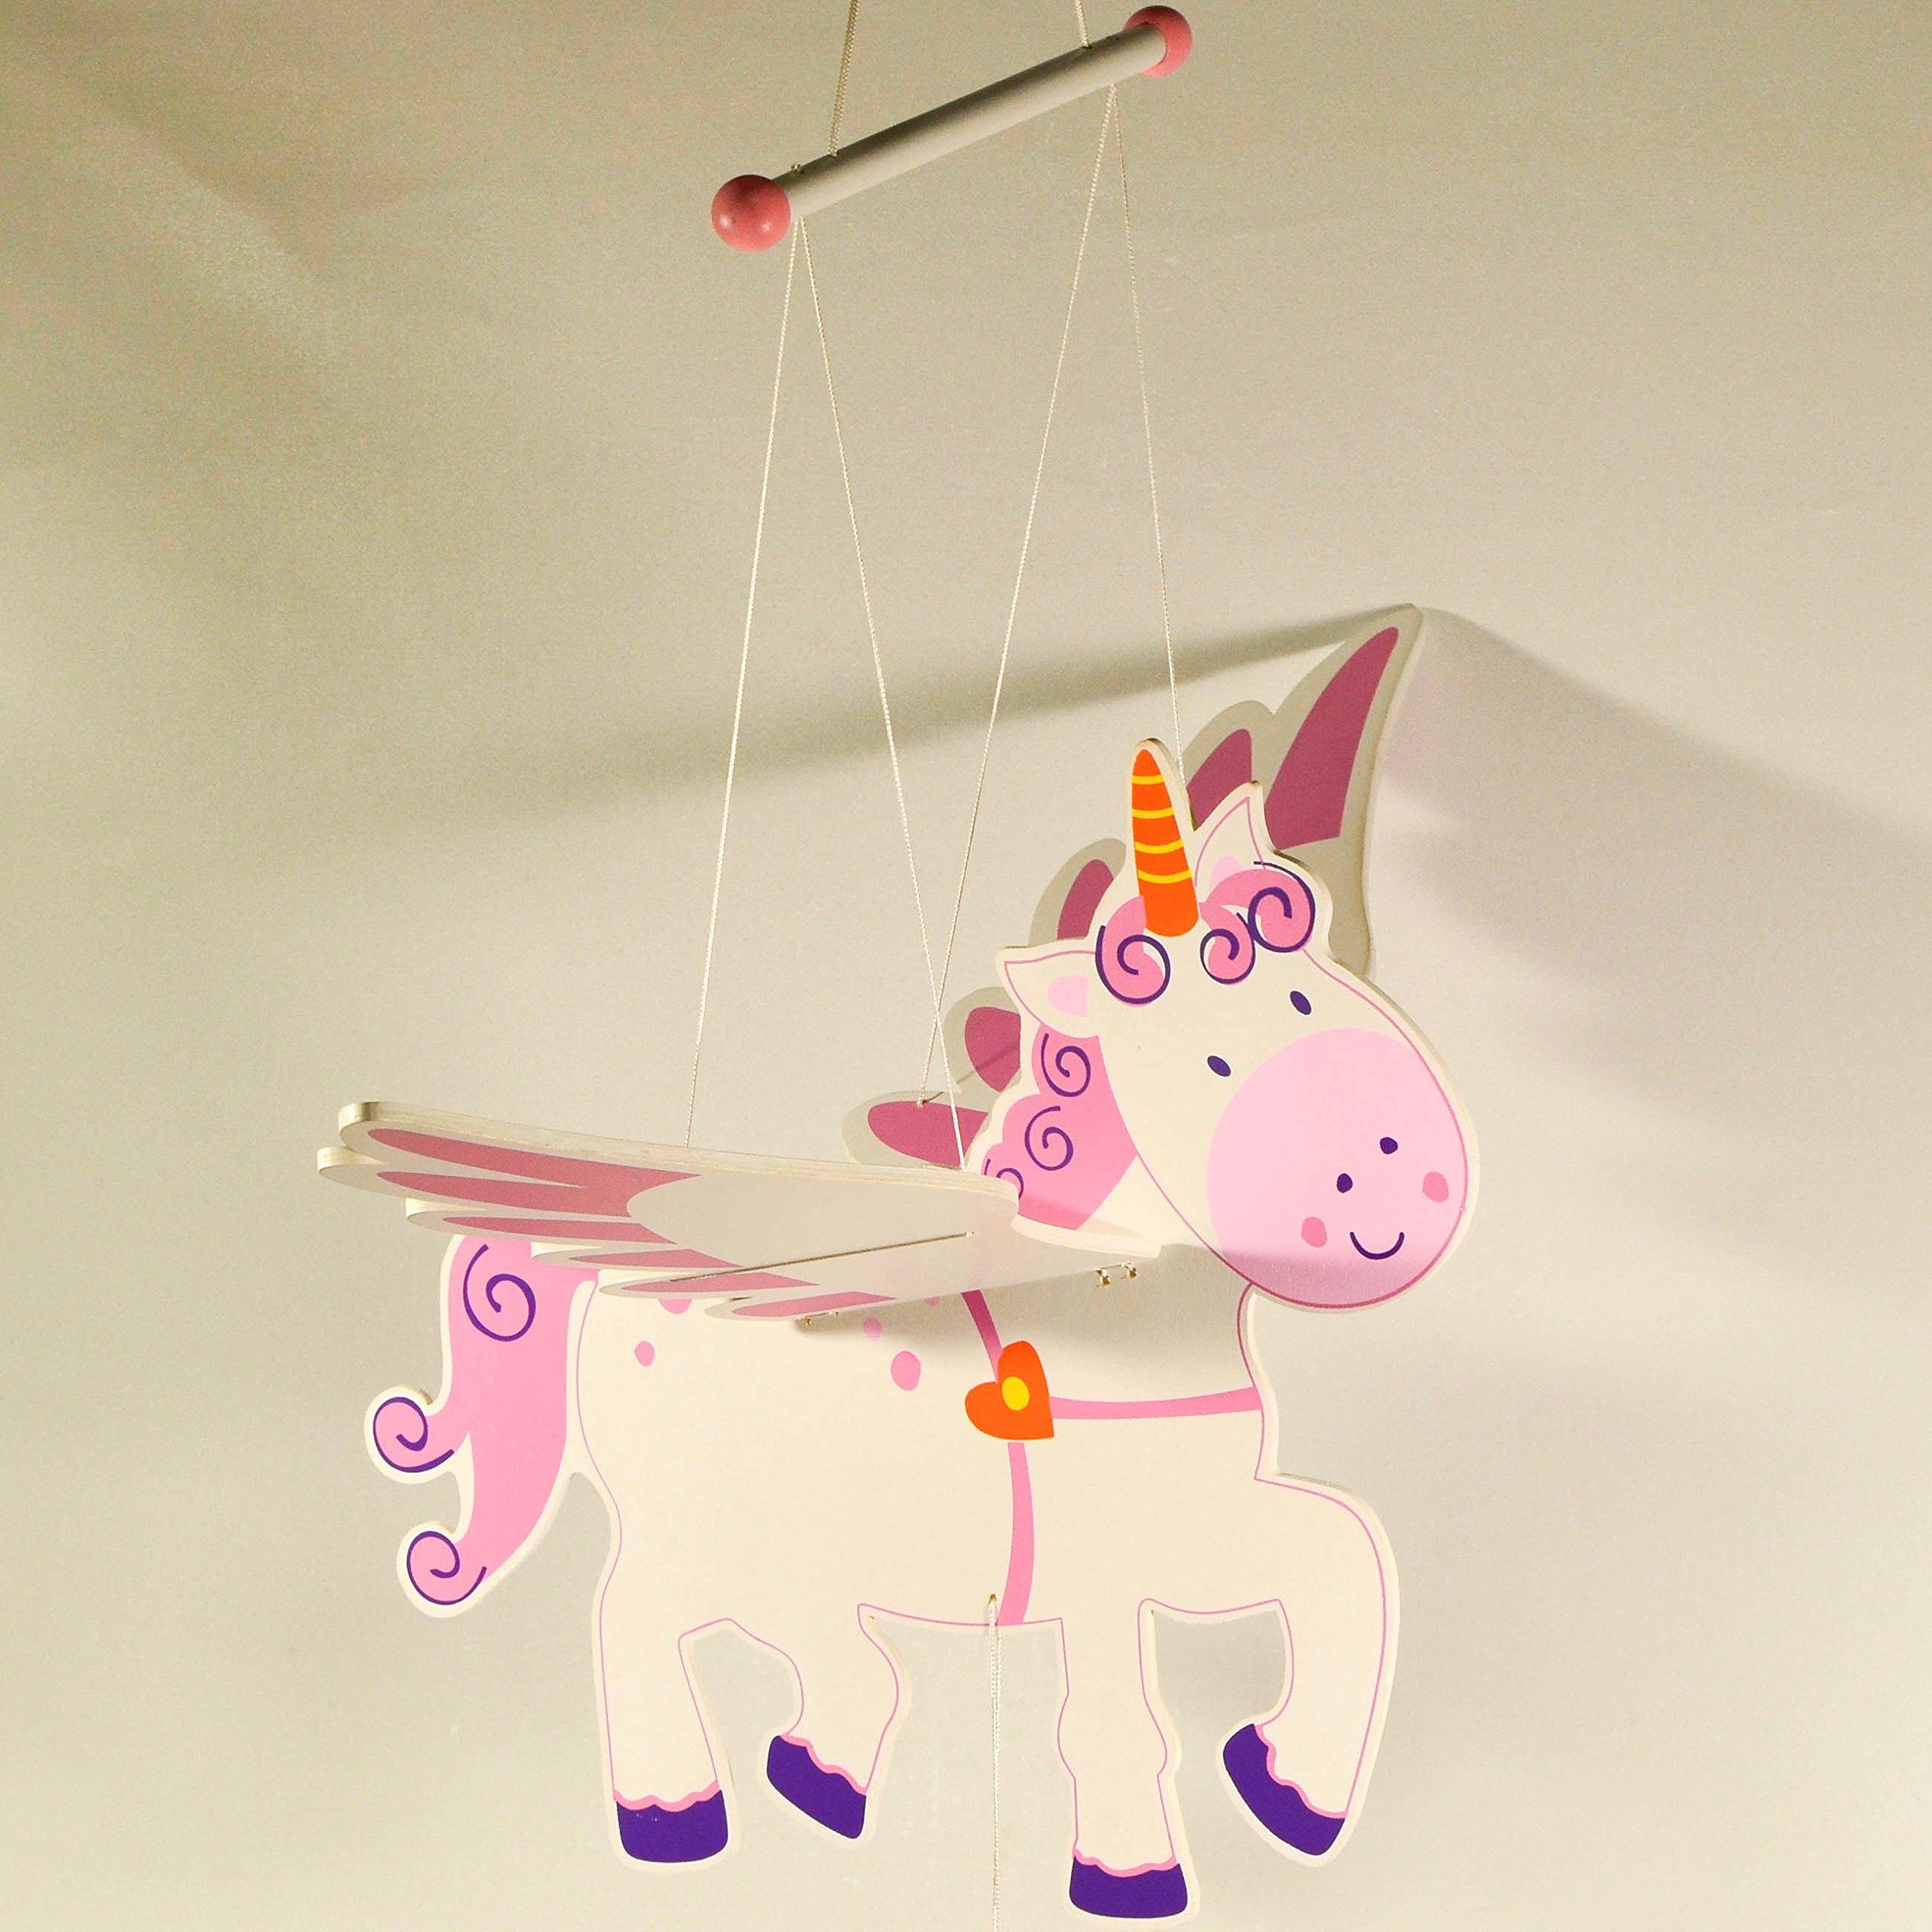 Wooden Hanging Mobile Unicorn - Nursery Decor - Baby Mobile Ornament - Baby Room Decor - Novelty Unicorn Decoration by EliteTreasures (Image #1)